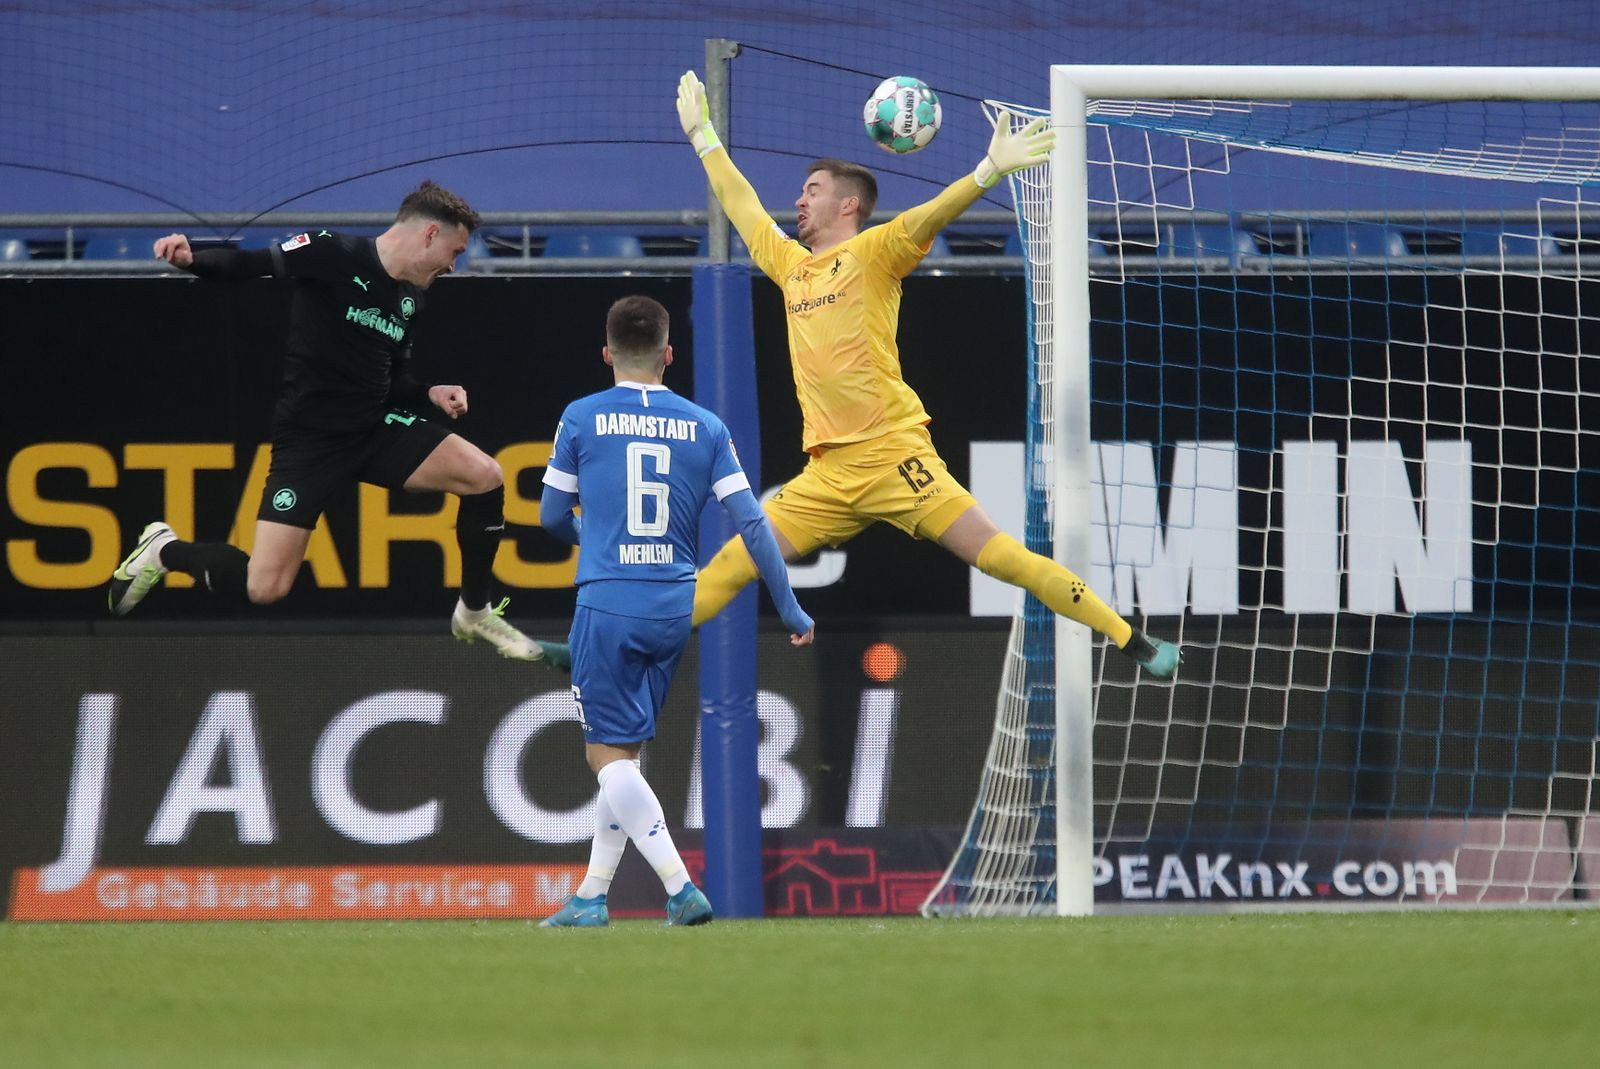 SV Darmstadt 98 v SpVgg Greuther Fuerth - Second Bundesliga